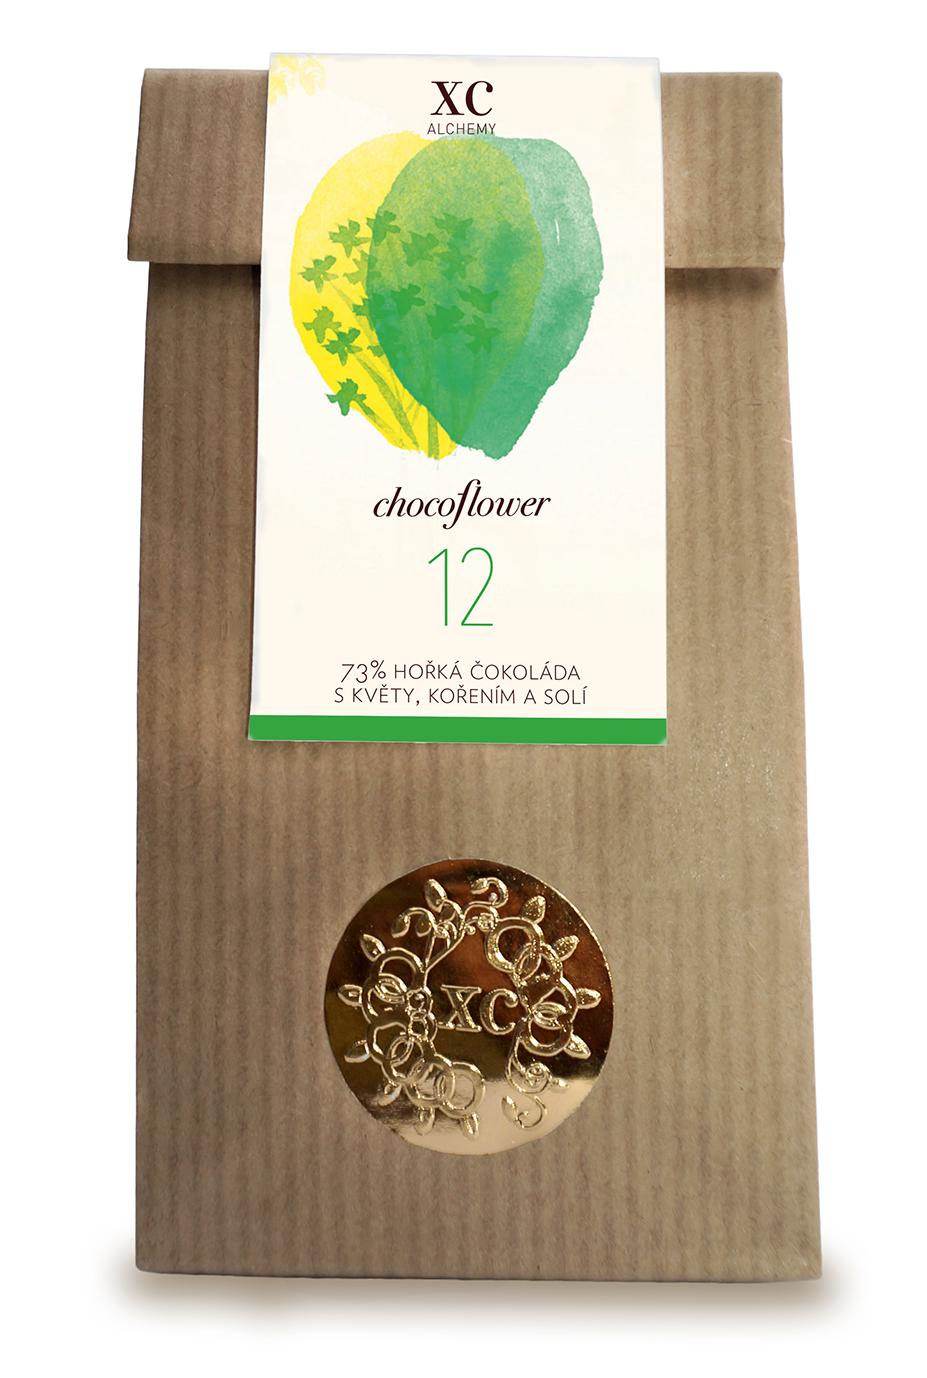 xc chocoflower 12 nana L